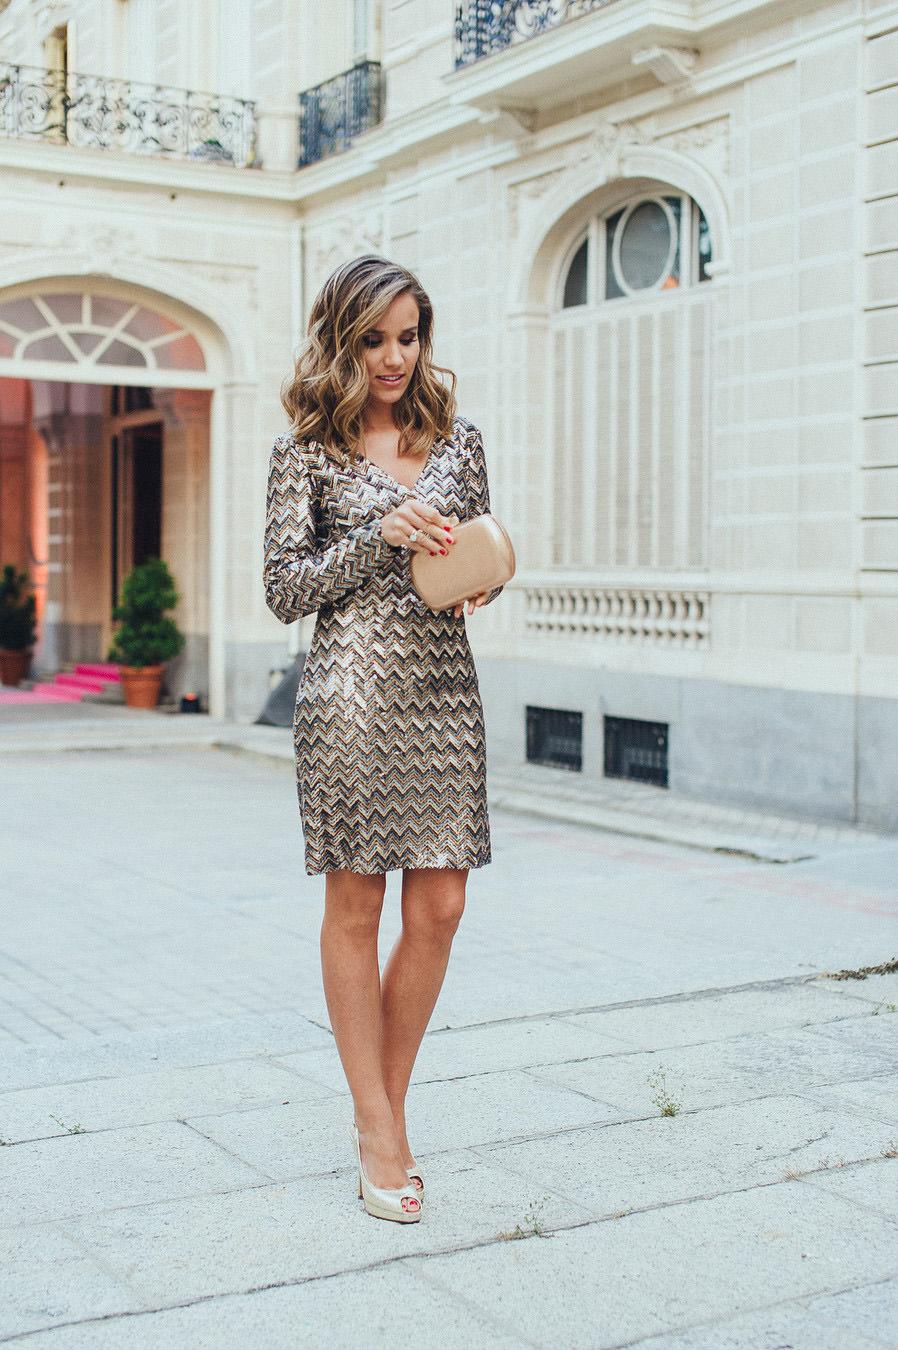 calista-one-lista-de-bodas-online-blog-de-bodas-bossanova-looks-invitadas-jeremy-sanders-2